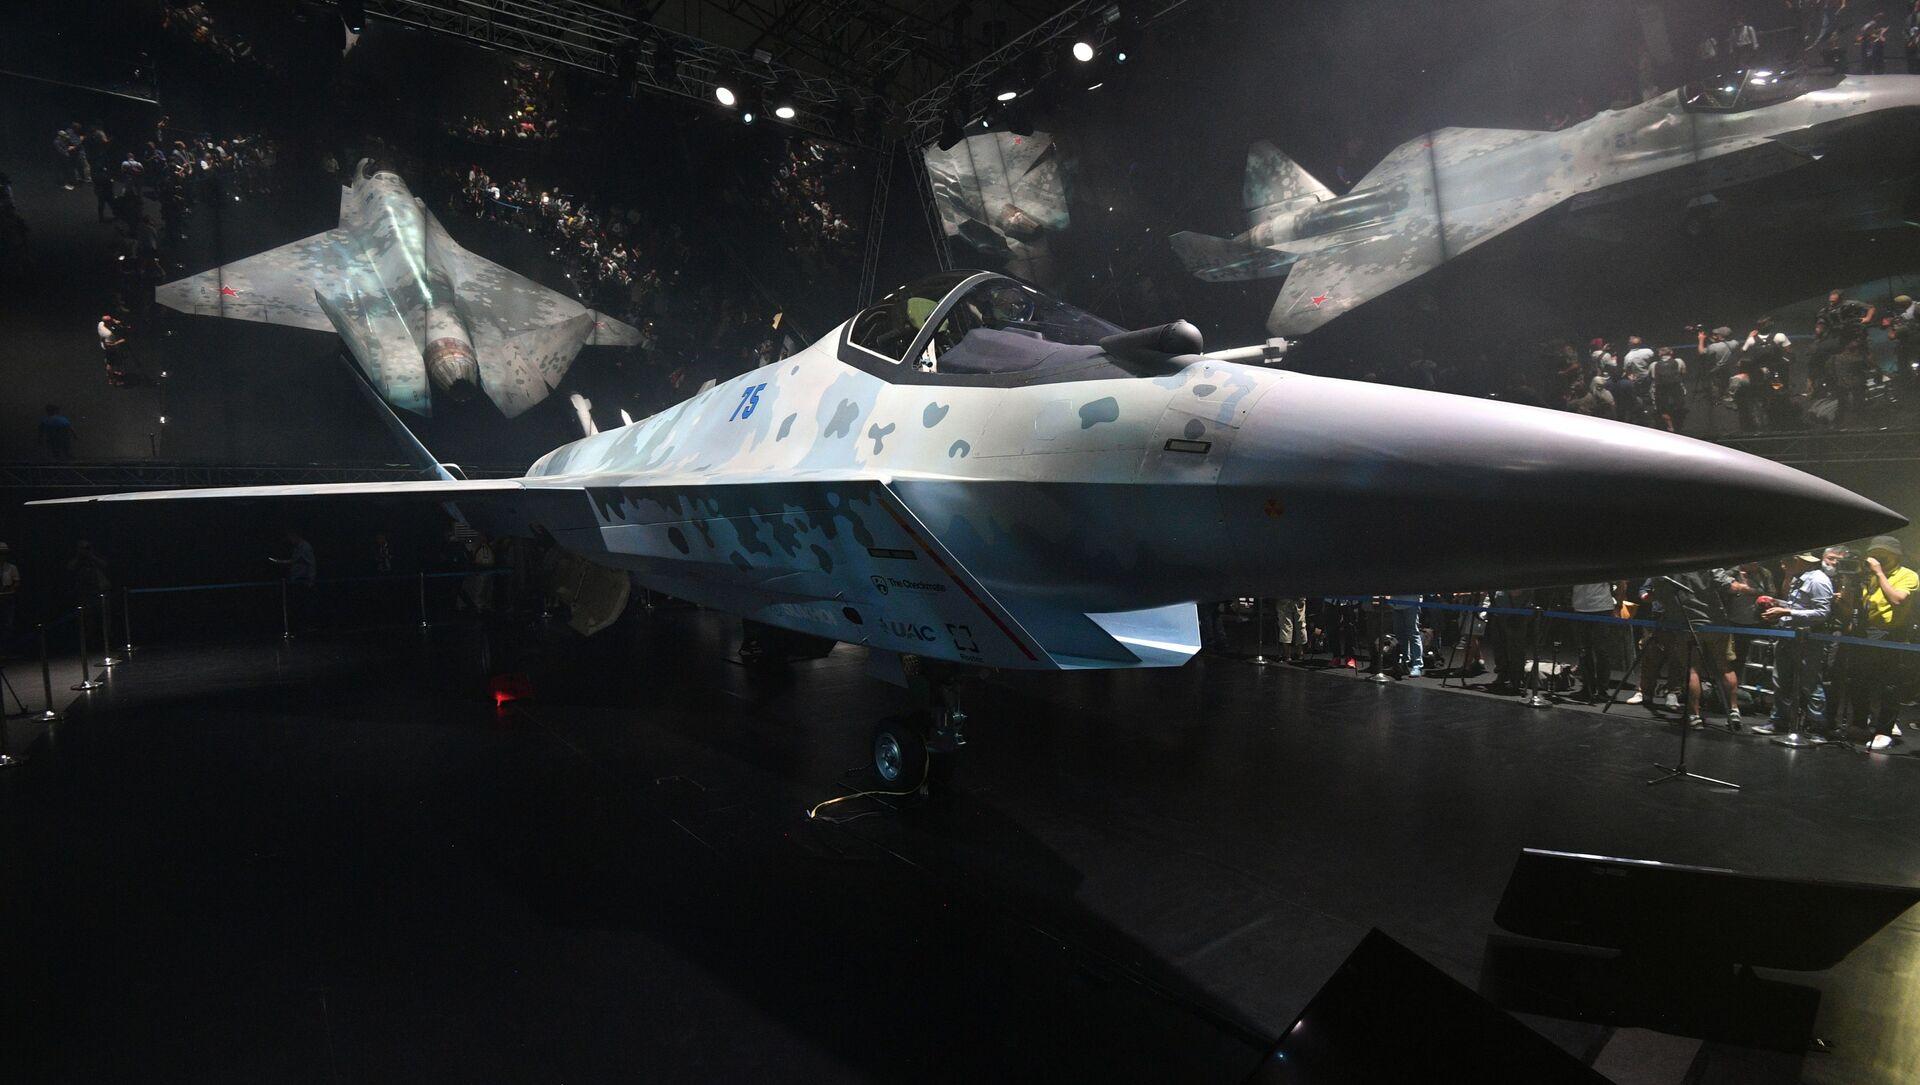 Le chasseur russe Su-75 Checkmate - Sputnik France, 1920, 03.09.2021